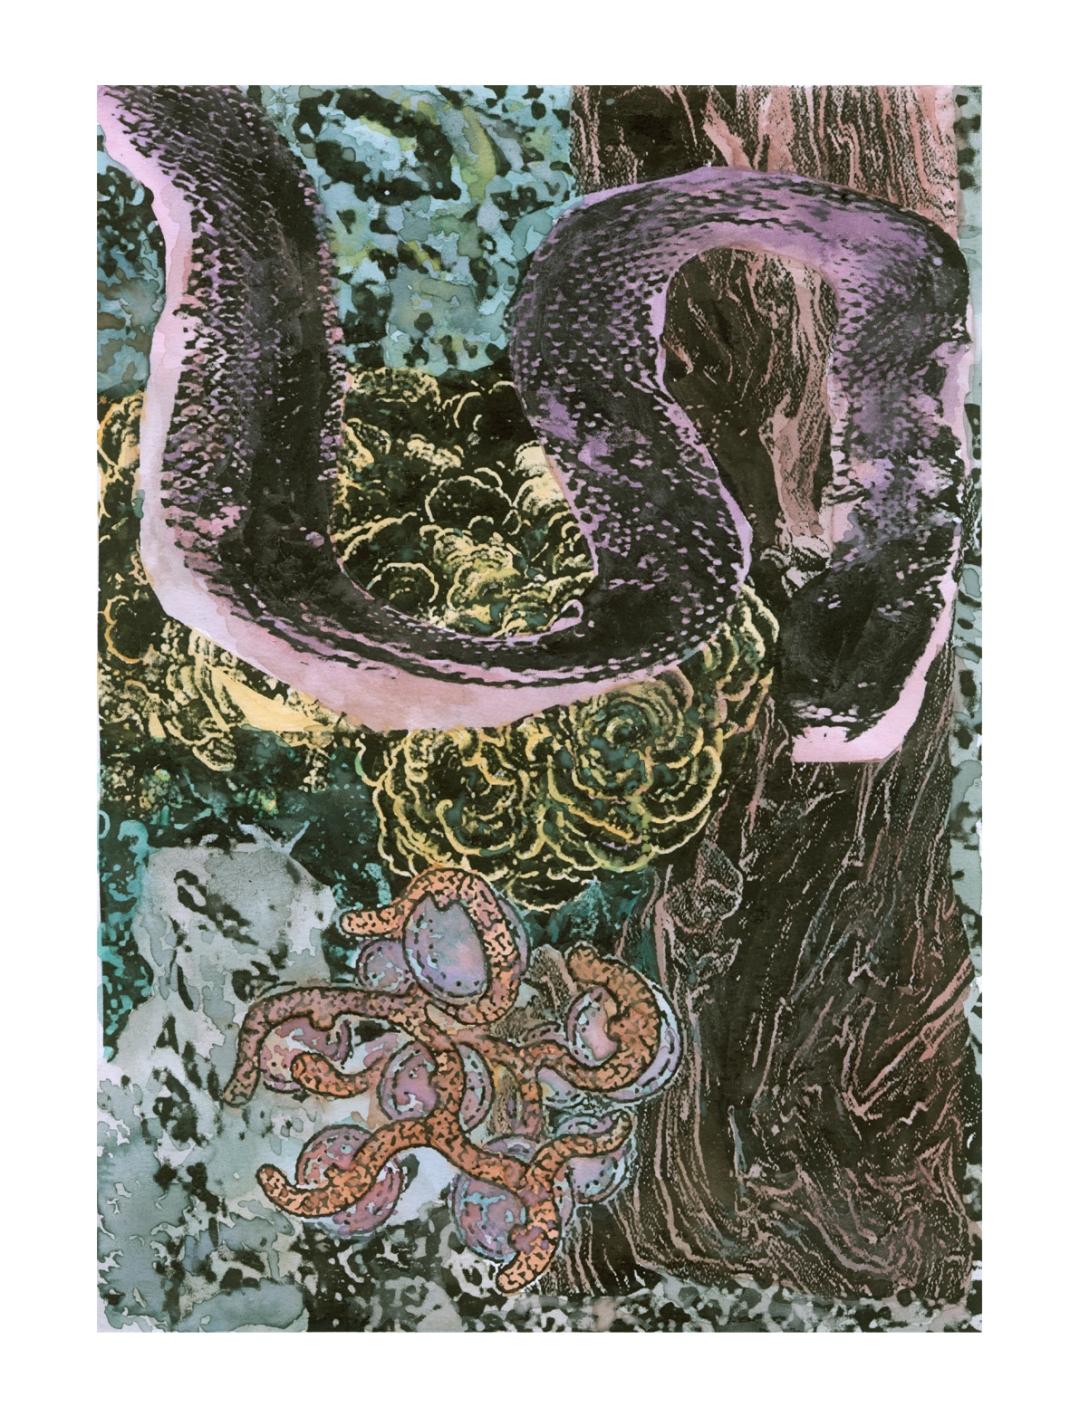 asbjorn-skou-snake-insta